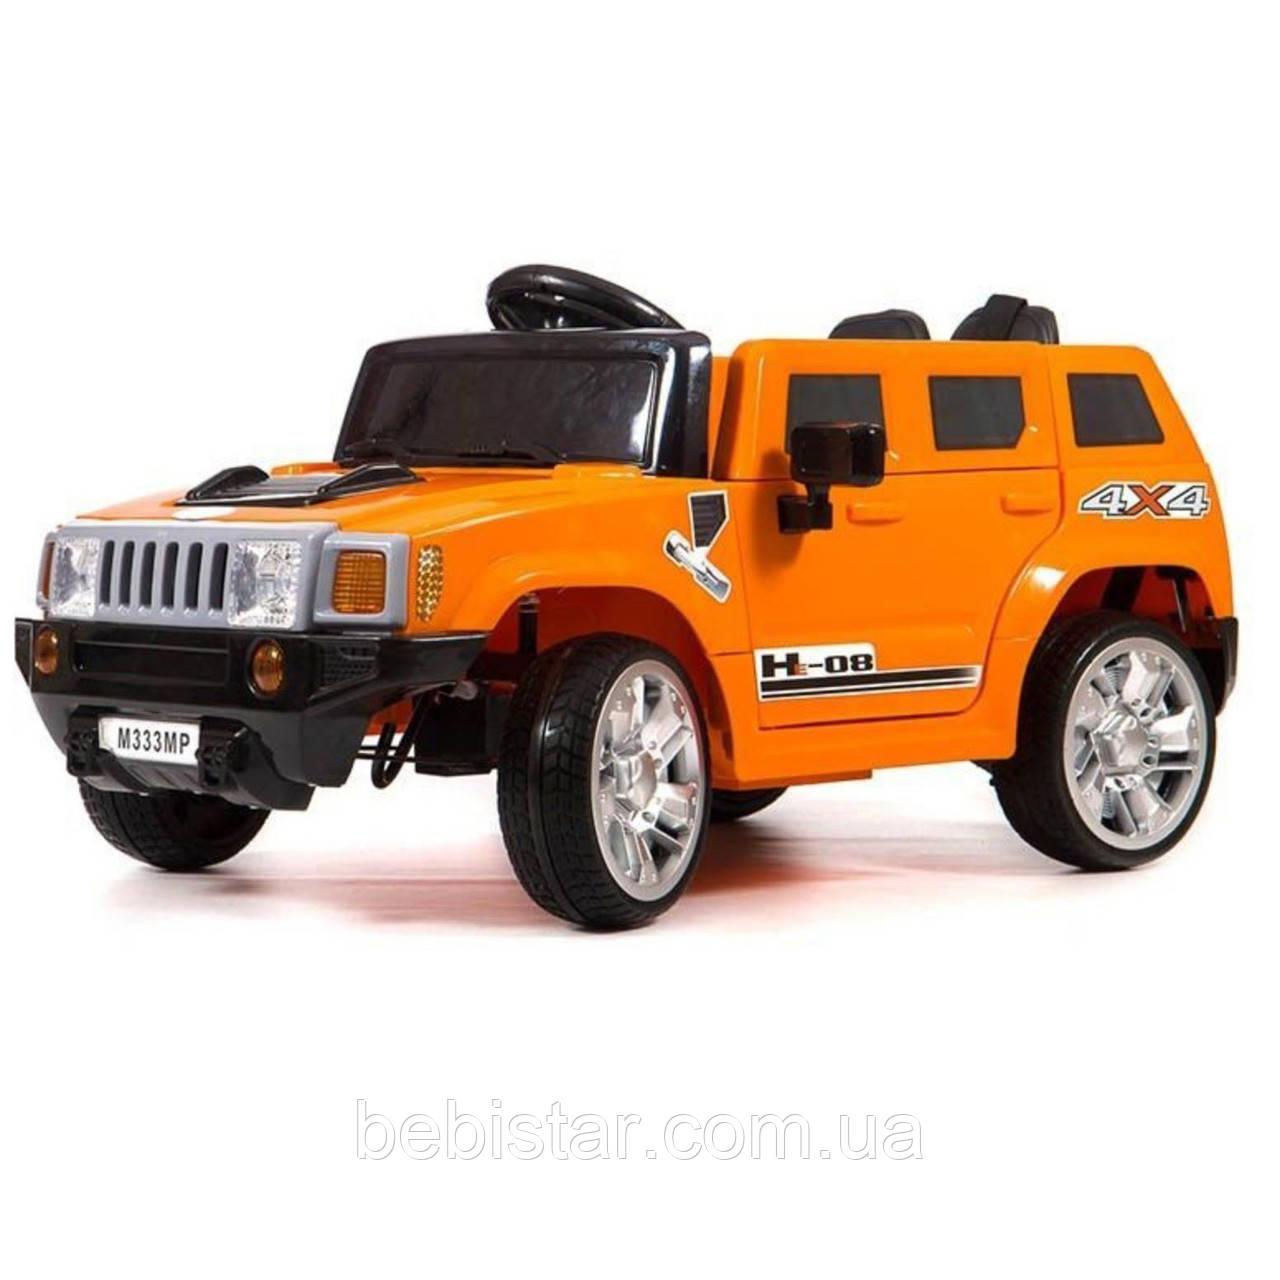 Детский электромобиль Джип T-7831 ORANGE мотор 2*25W аккумулятор 2*6V4,5AH с MP3